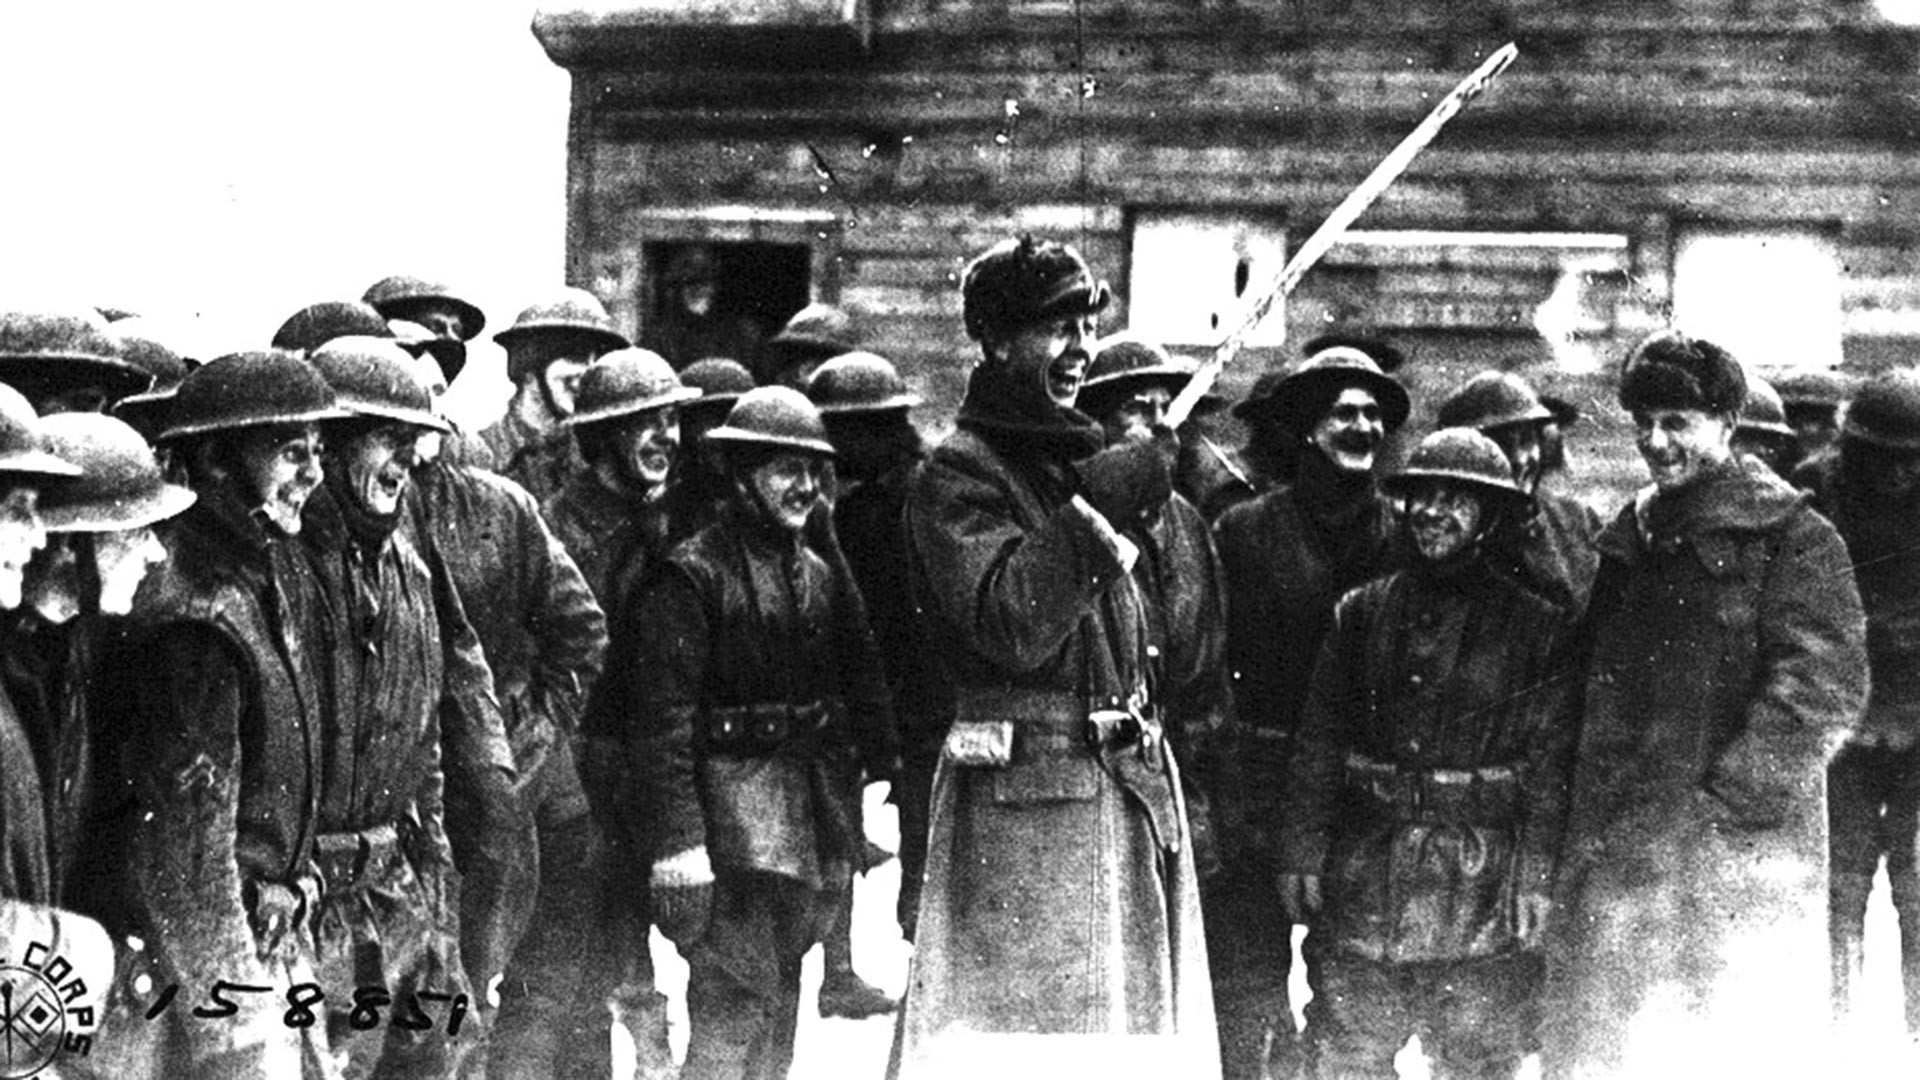 Seorang kapten tentara Amerika dengan rampasan perang berupa pedang Bolshevik.